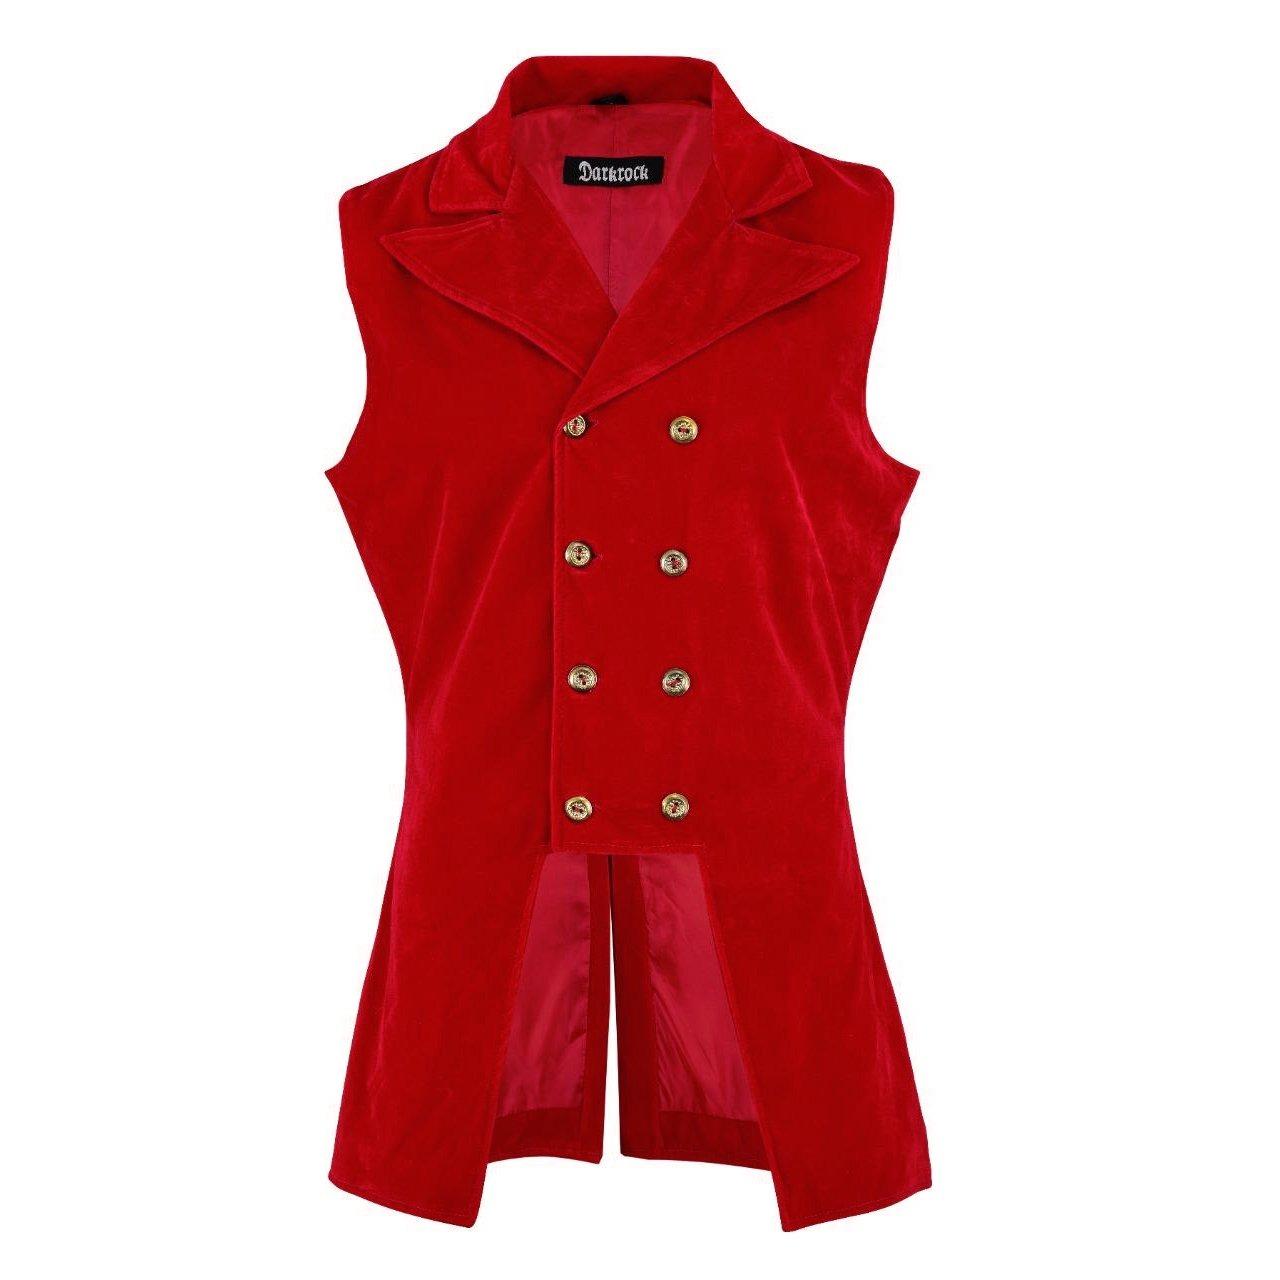 DARKROCK Men's Double Breasted GOVERNOR Vest Waistcoat VTG Red Velvet Brocade(front)